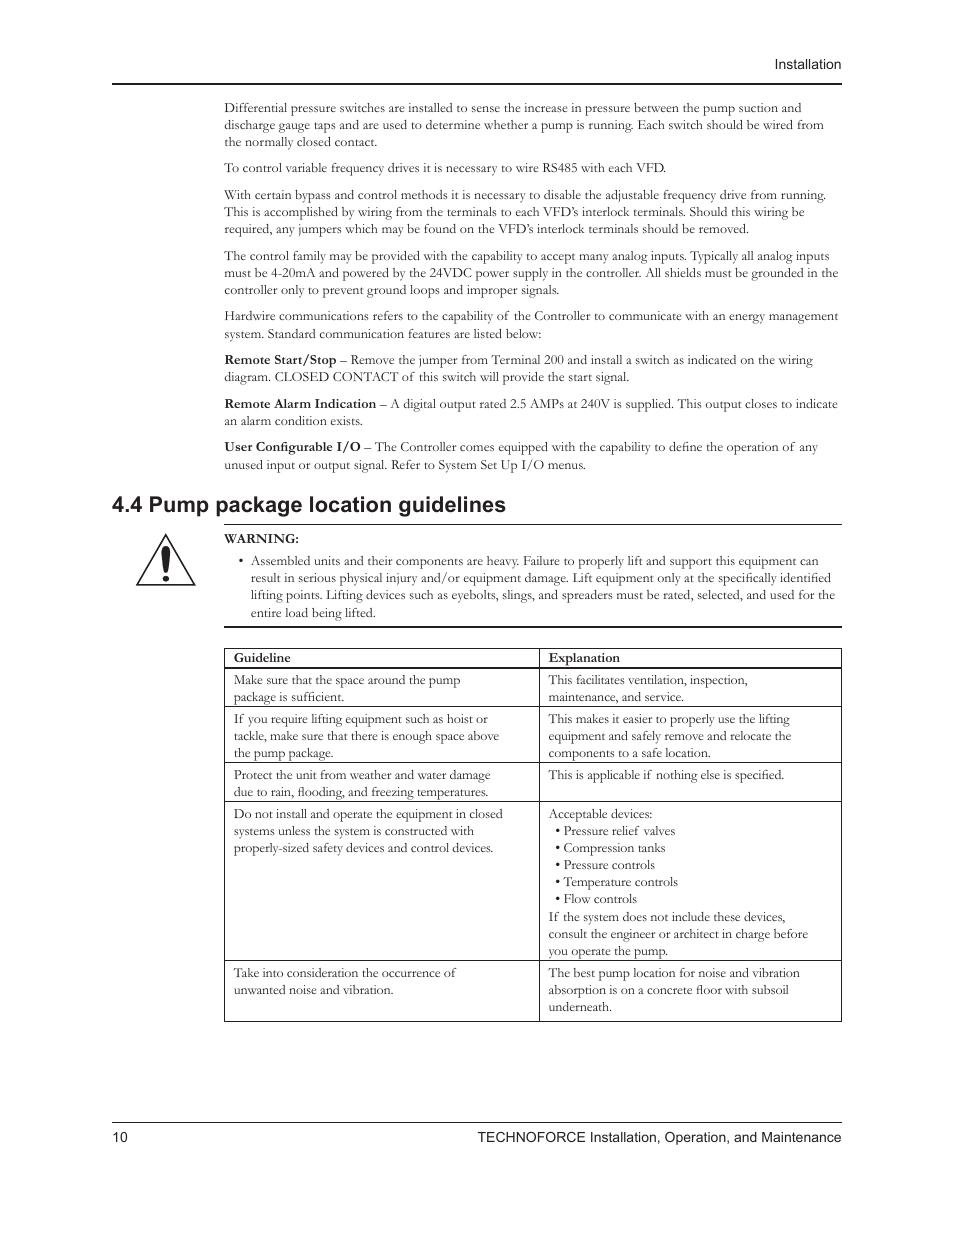 4 pump package location guidelines | Bell & Gossett 10 001 265R5  TechnoForce Pump Controller User